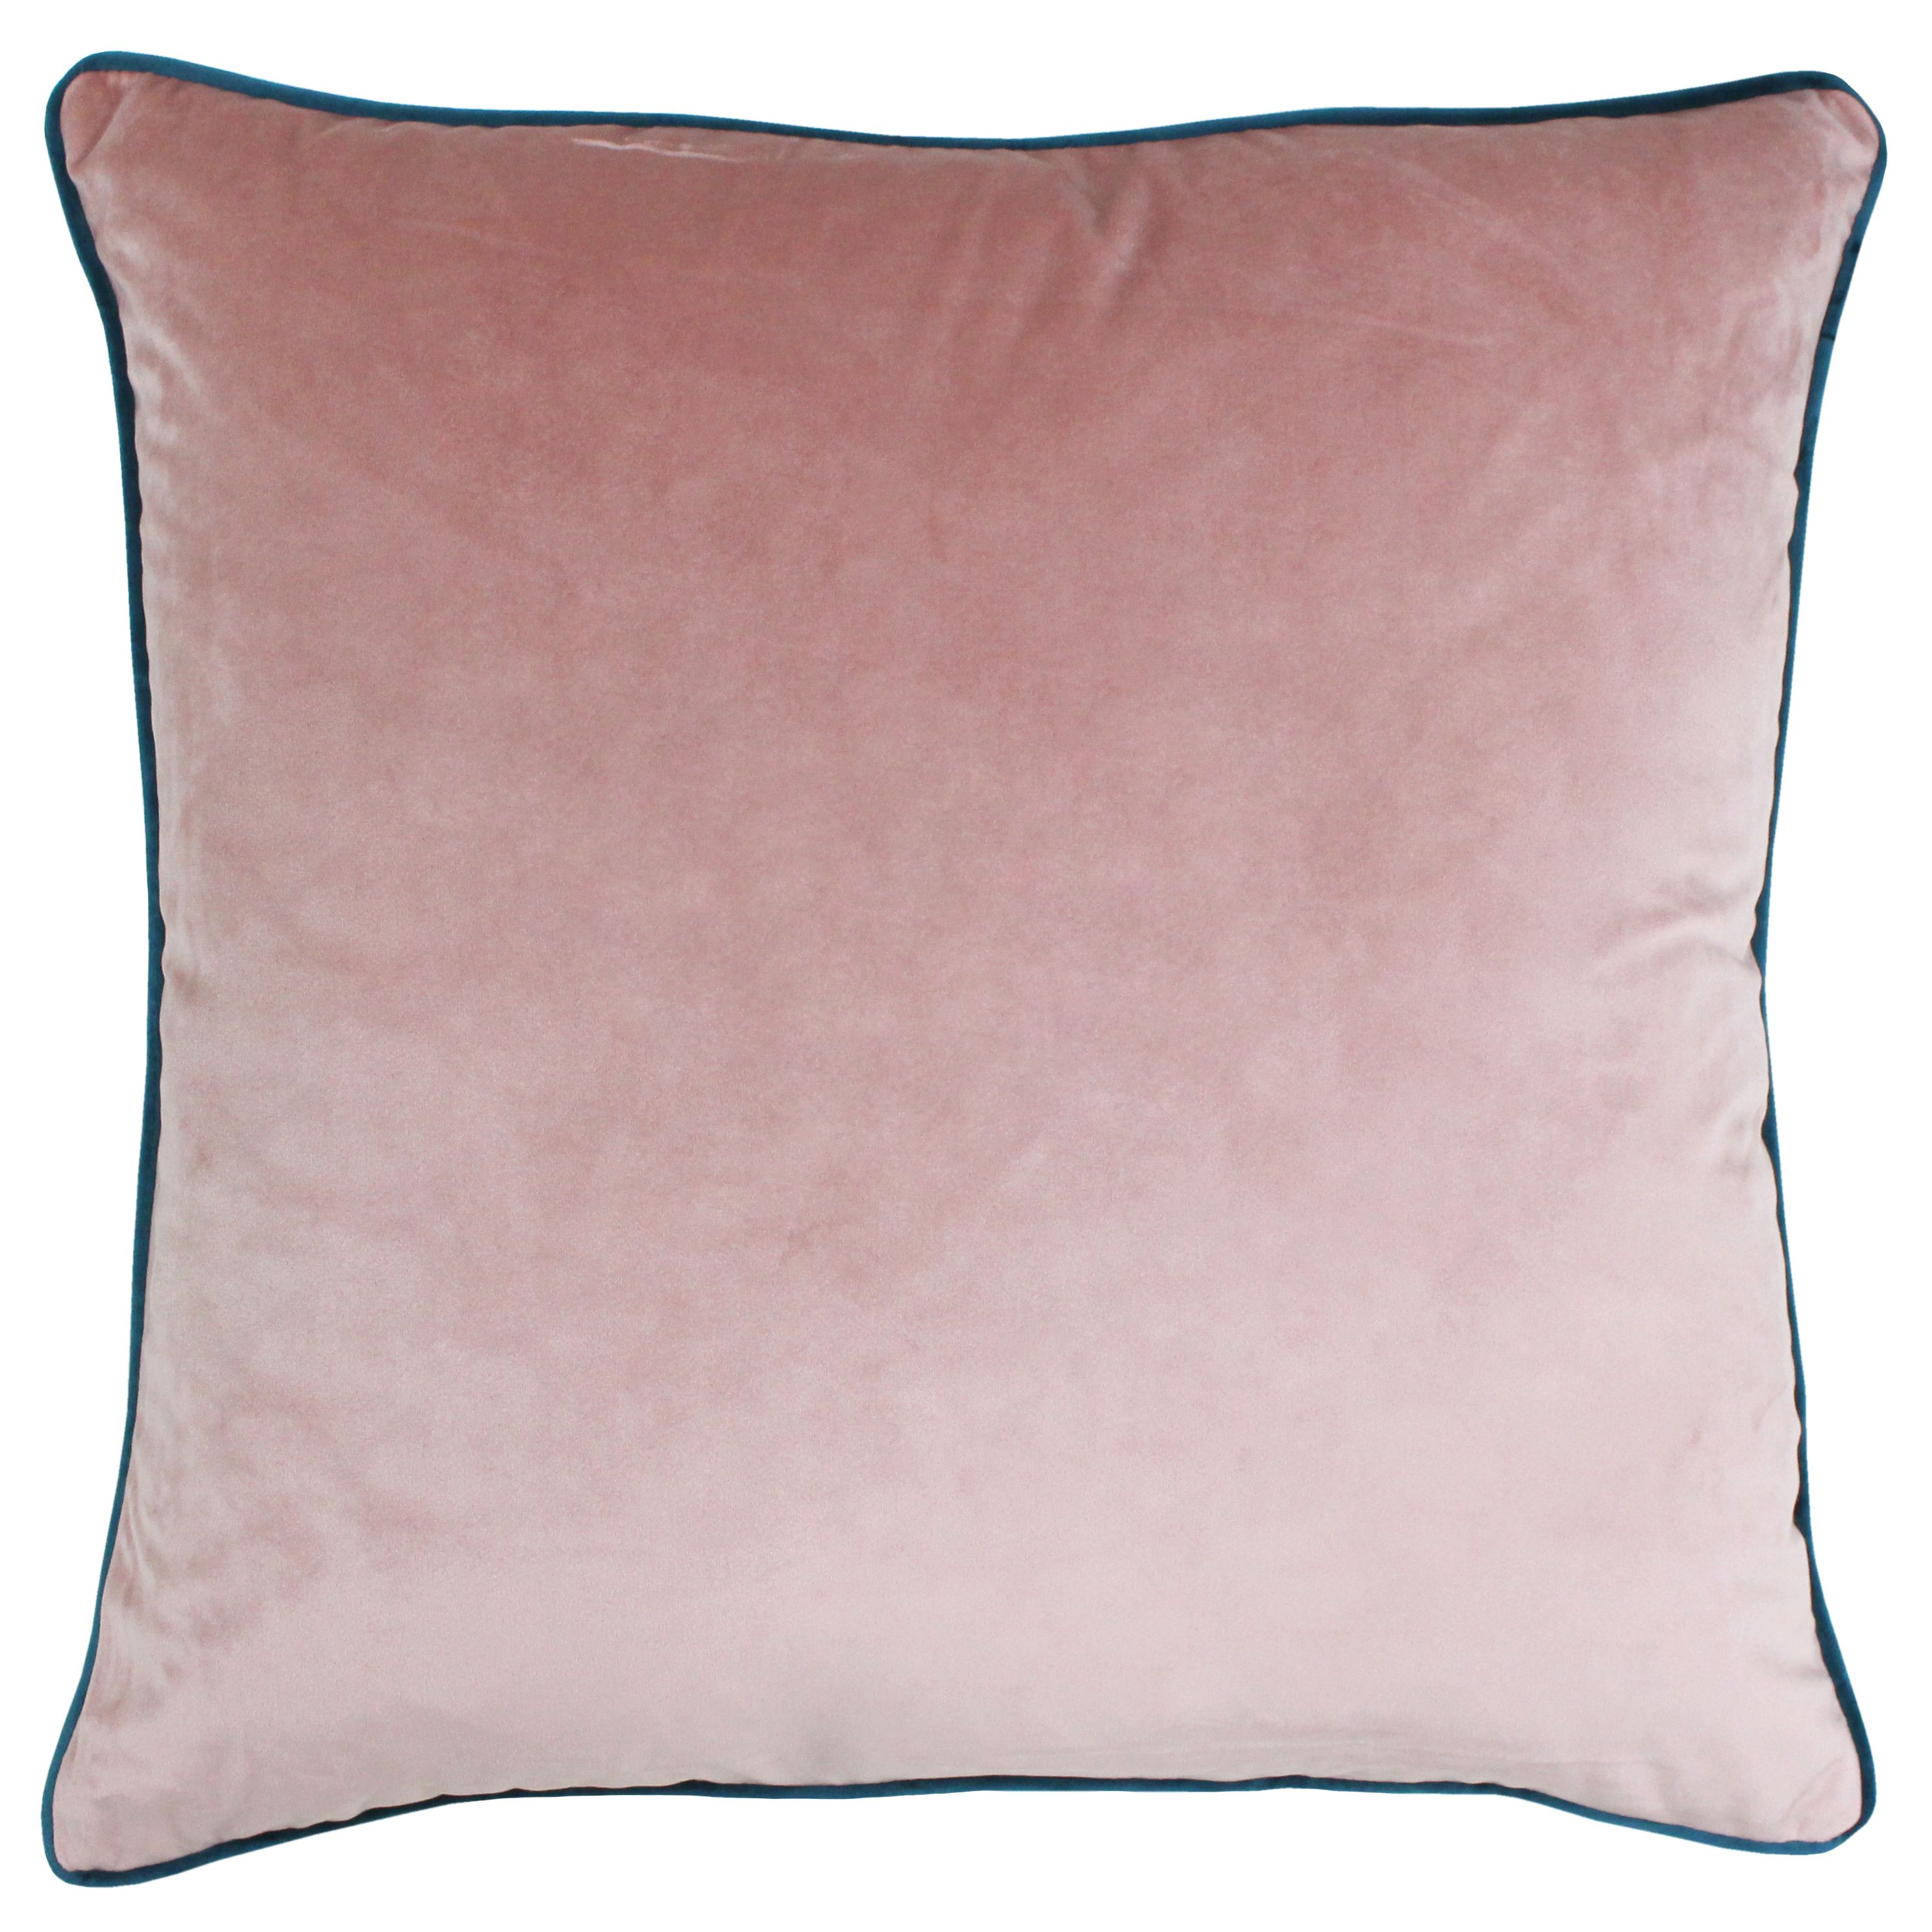 Meridian 55X55 Poly Cushion Blh/Tea